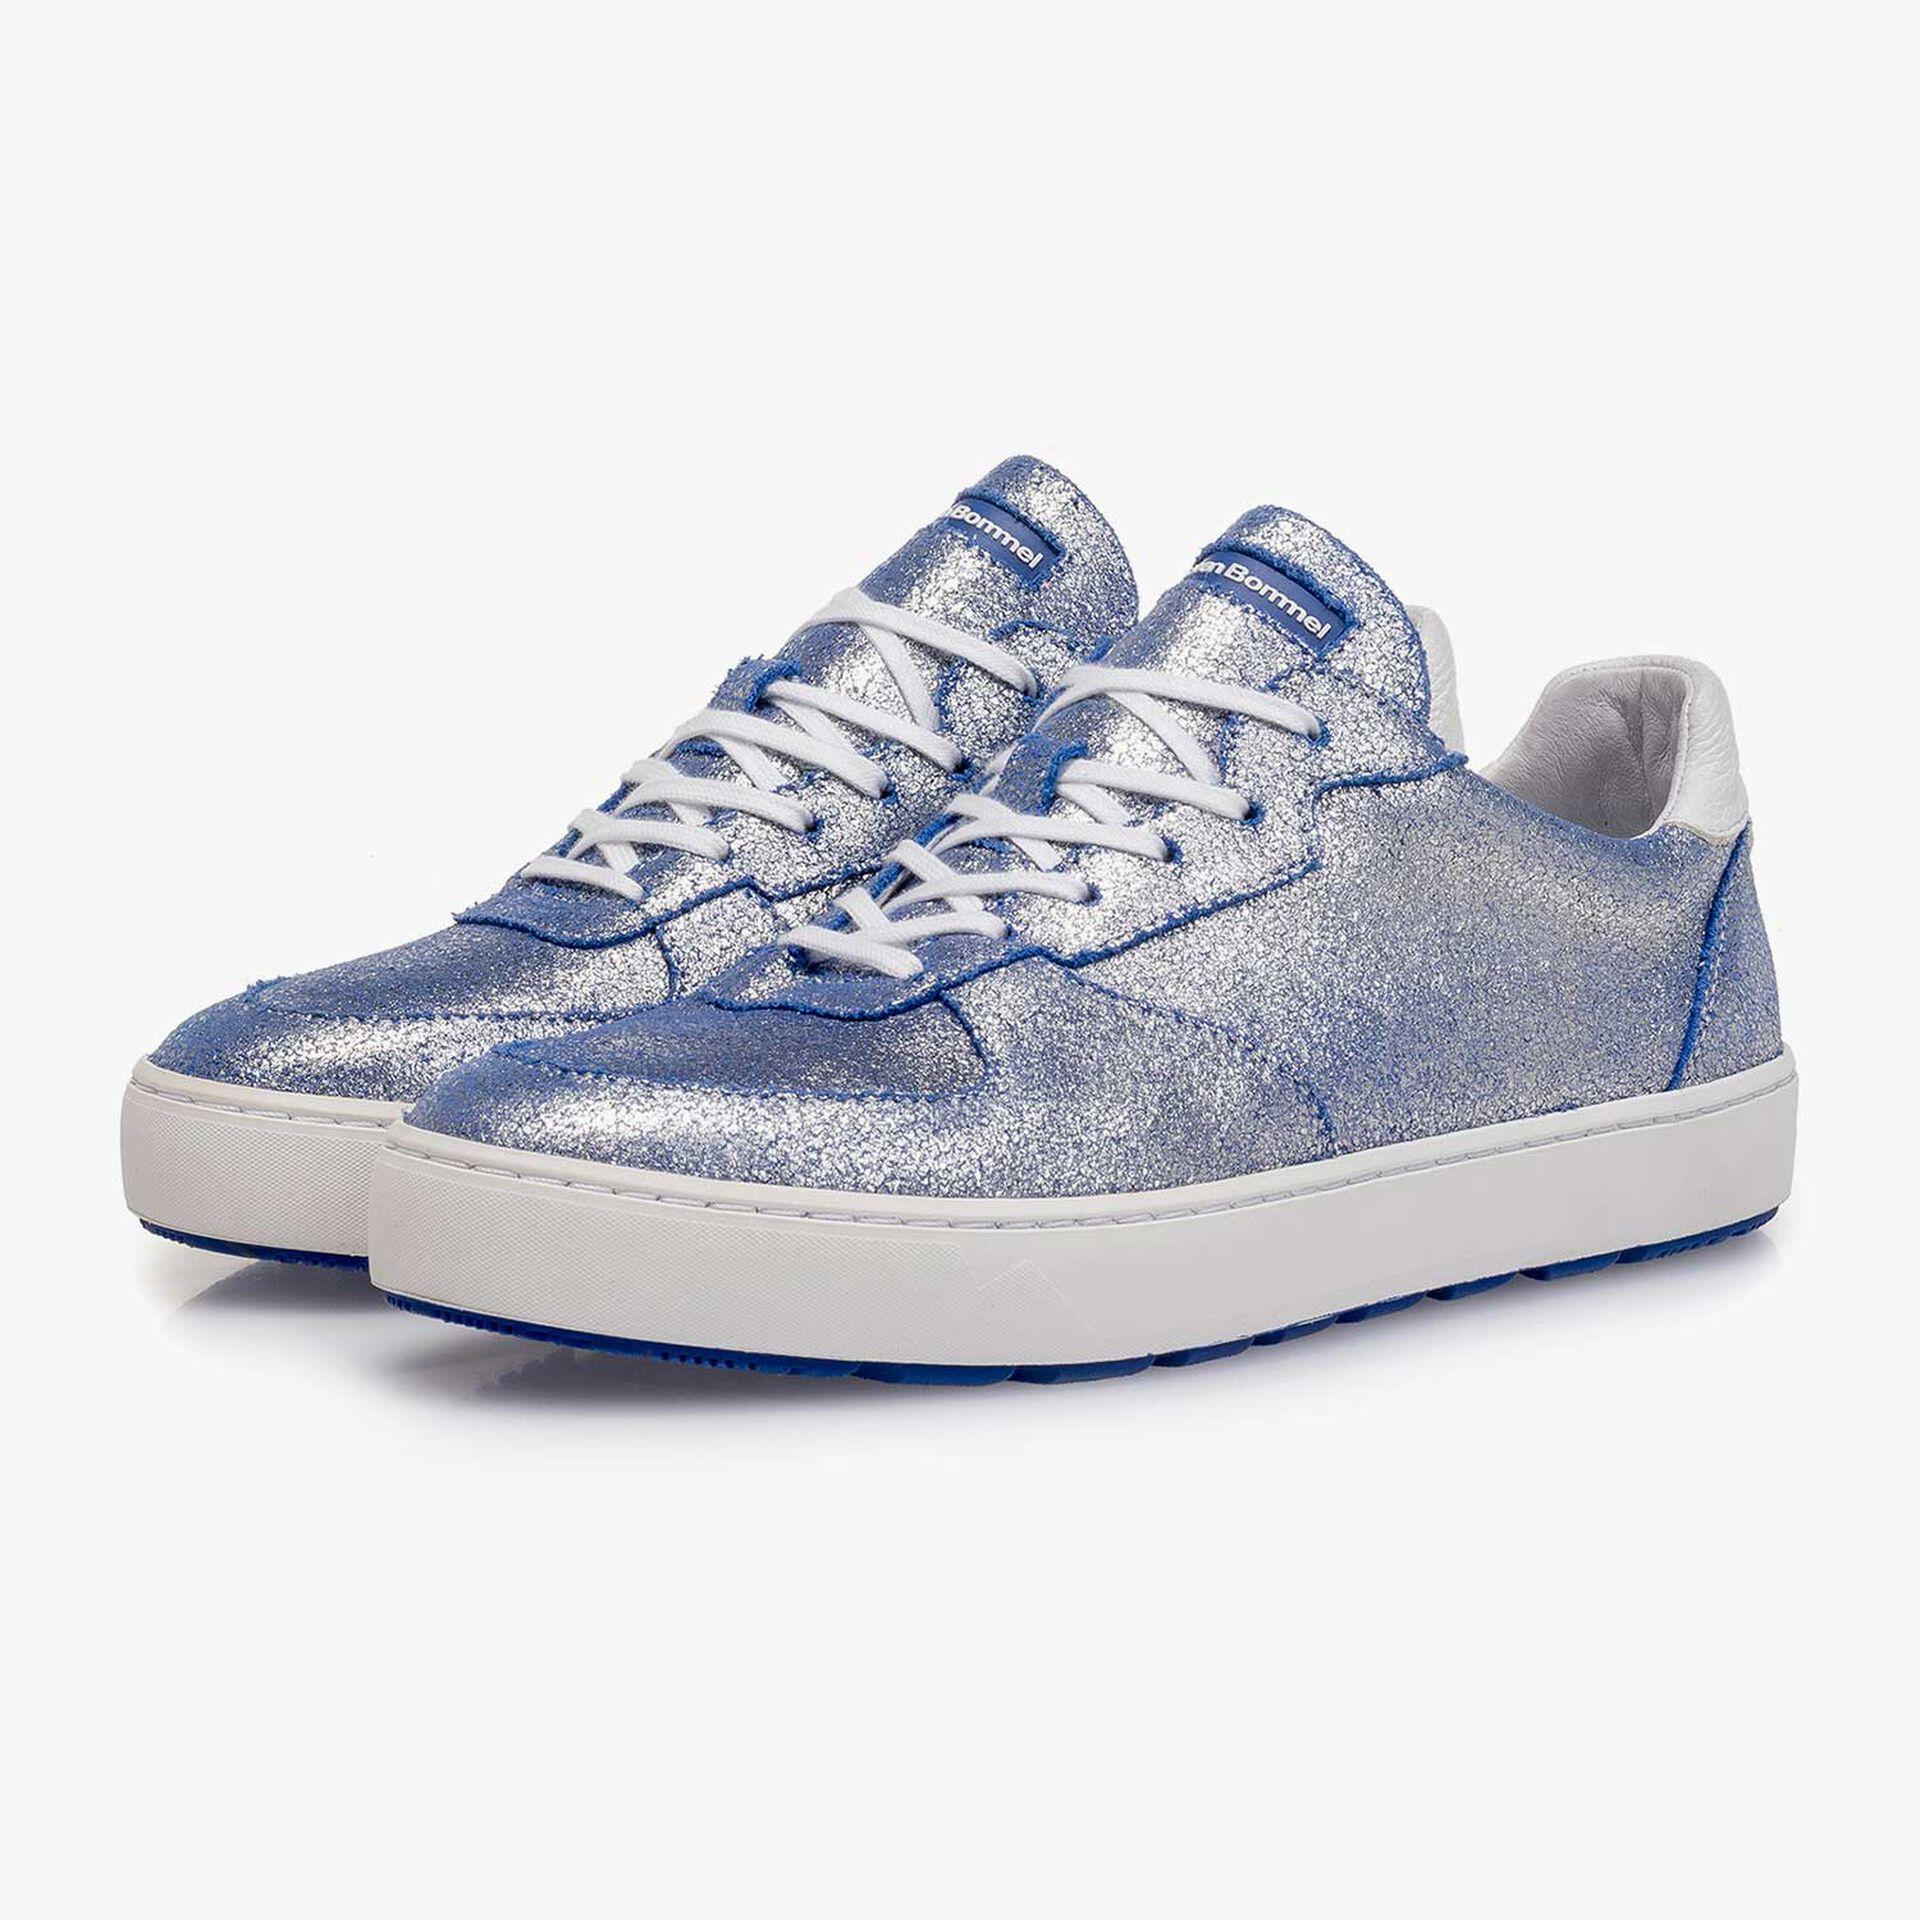 Silber Metallic Leder-Sneaker mit changierendem Effekt